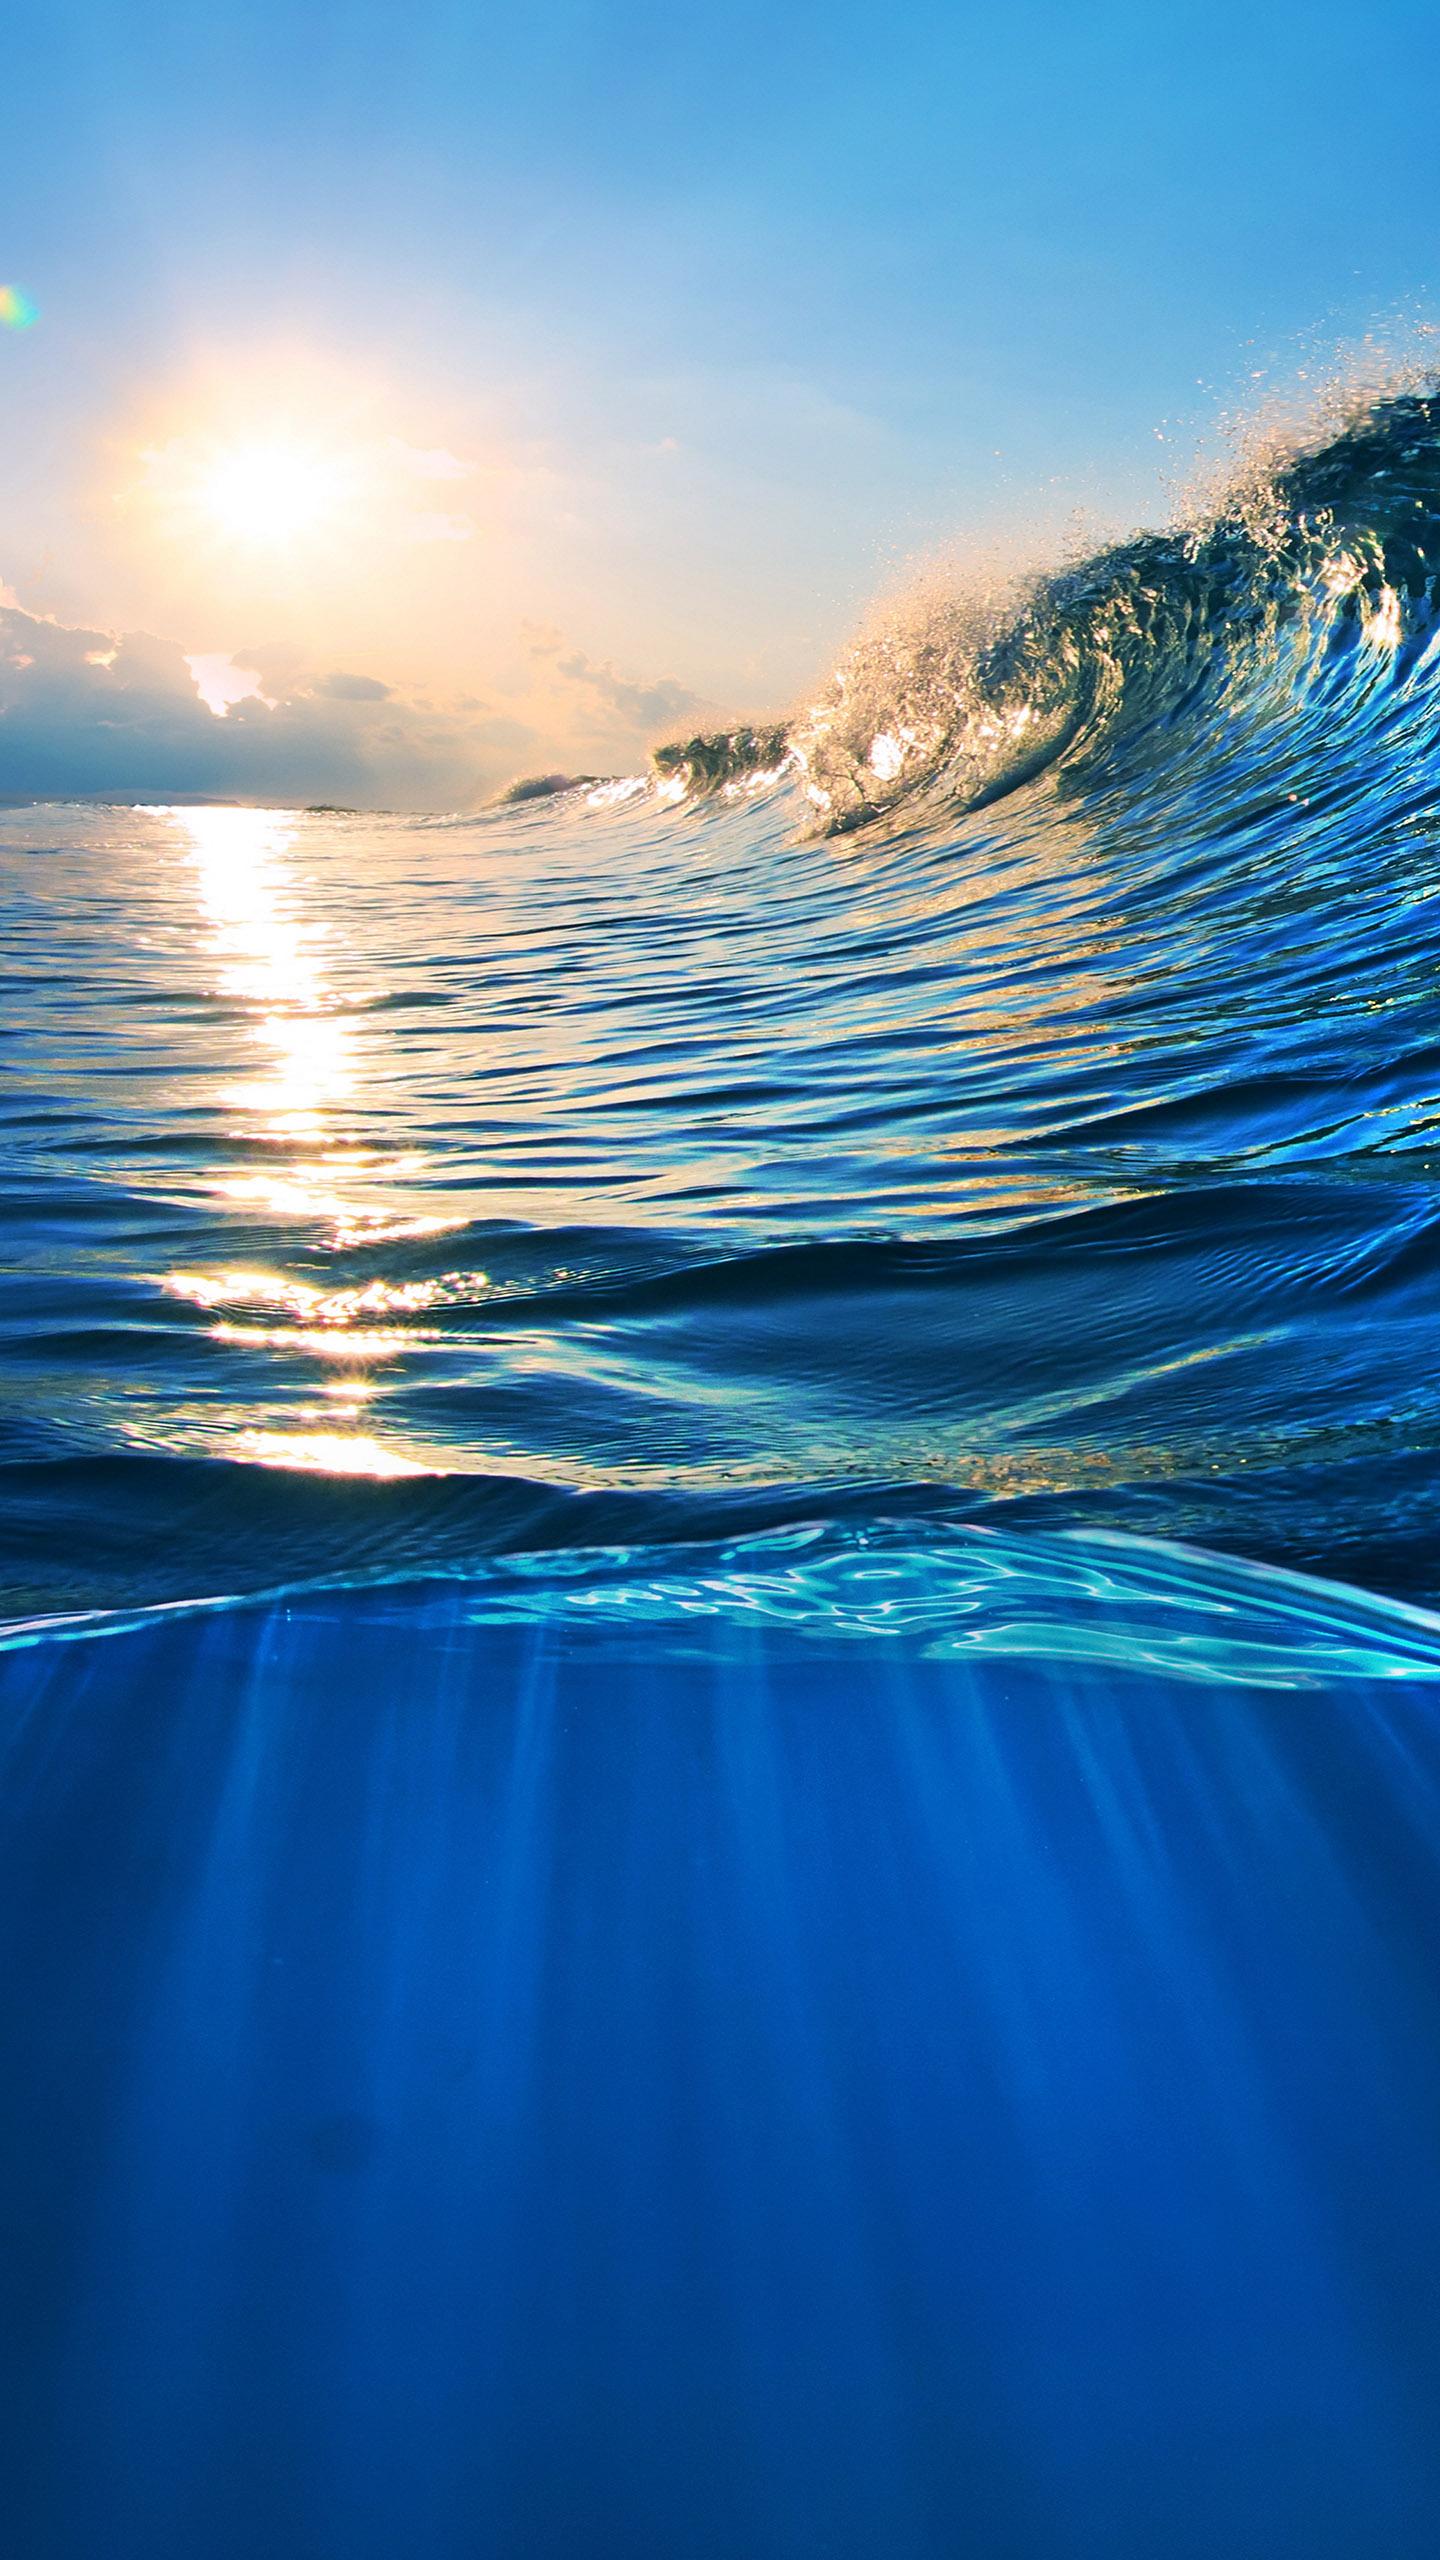 Ocean Wave Wallpapers For Galaxy S7 Blue Ocean Wallpaper 4k 1440x2560 Download Hd Wallpaper Wallpapertip